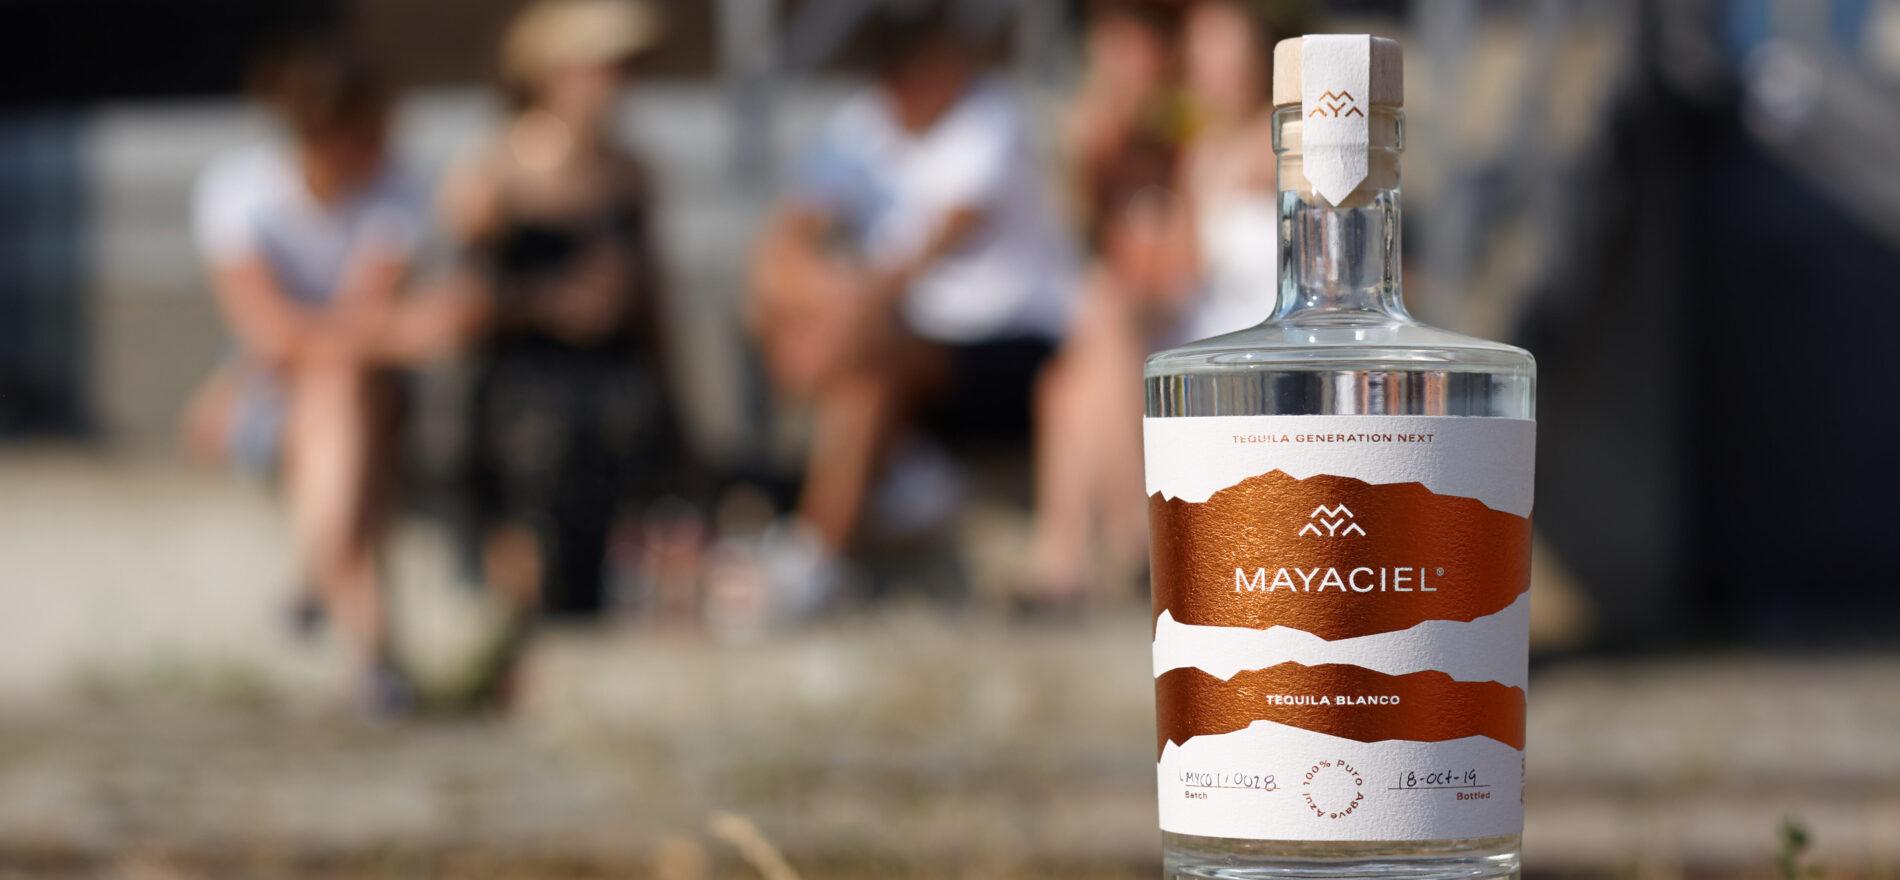 Mayaciel Tequila